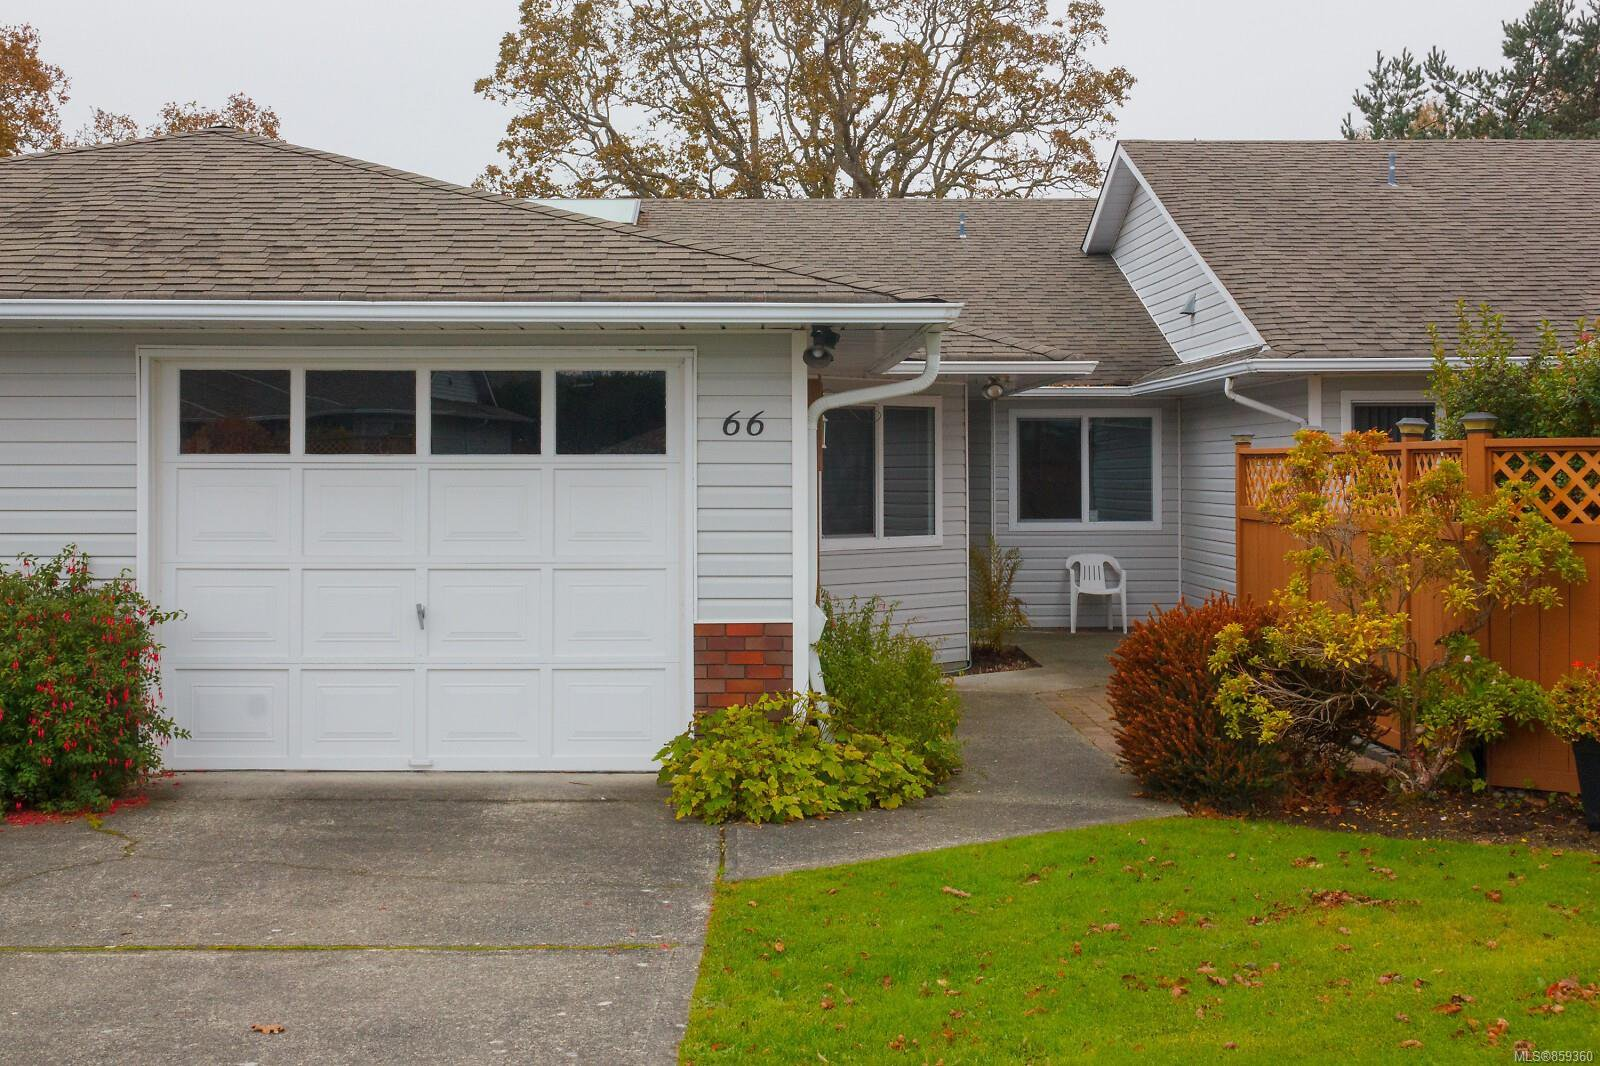 Main Photo: 66 4125 Interurban Rd in : SW Northridge Row/Townhouse for sale (Saanich West)  : MLS®# 859360